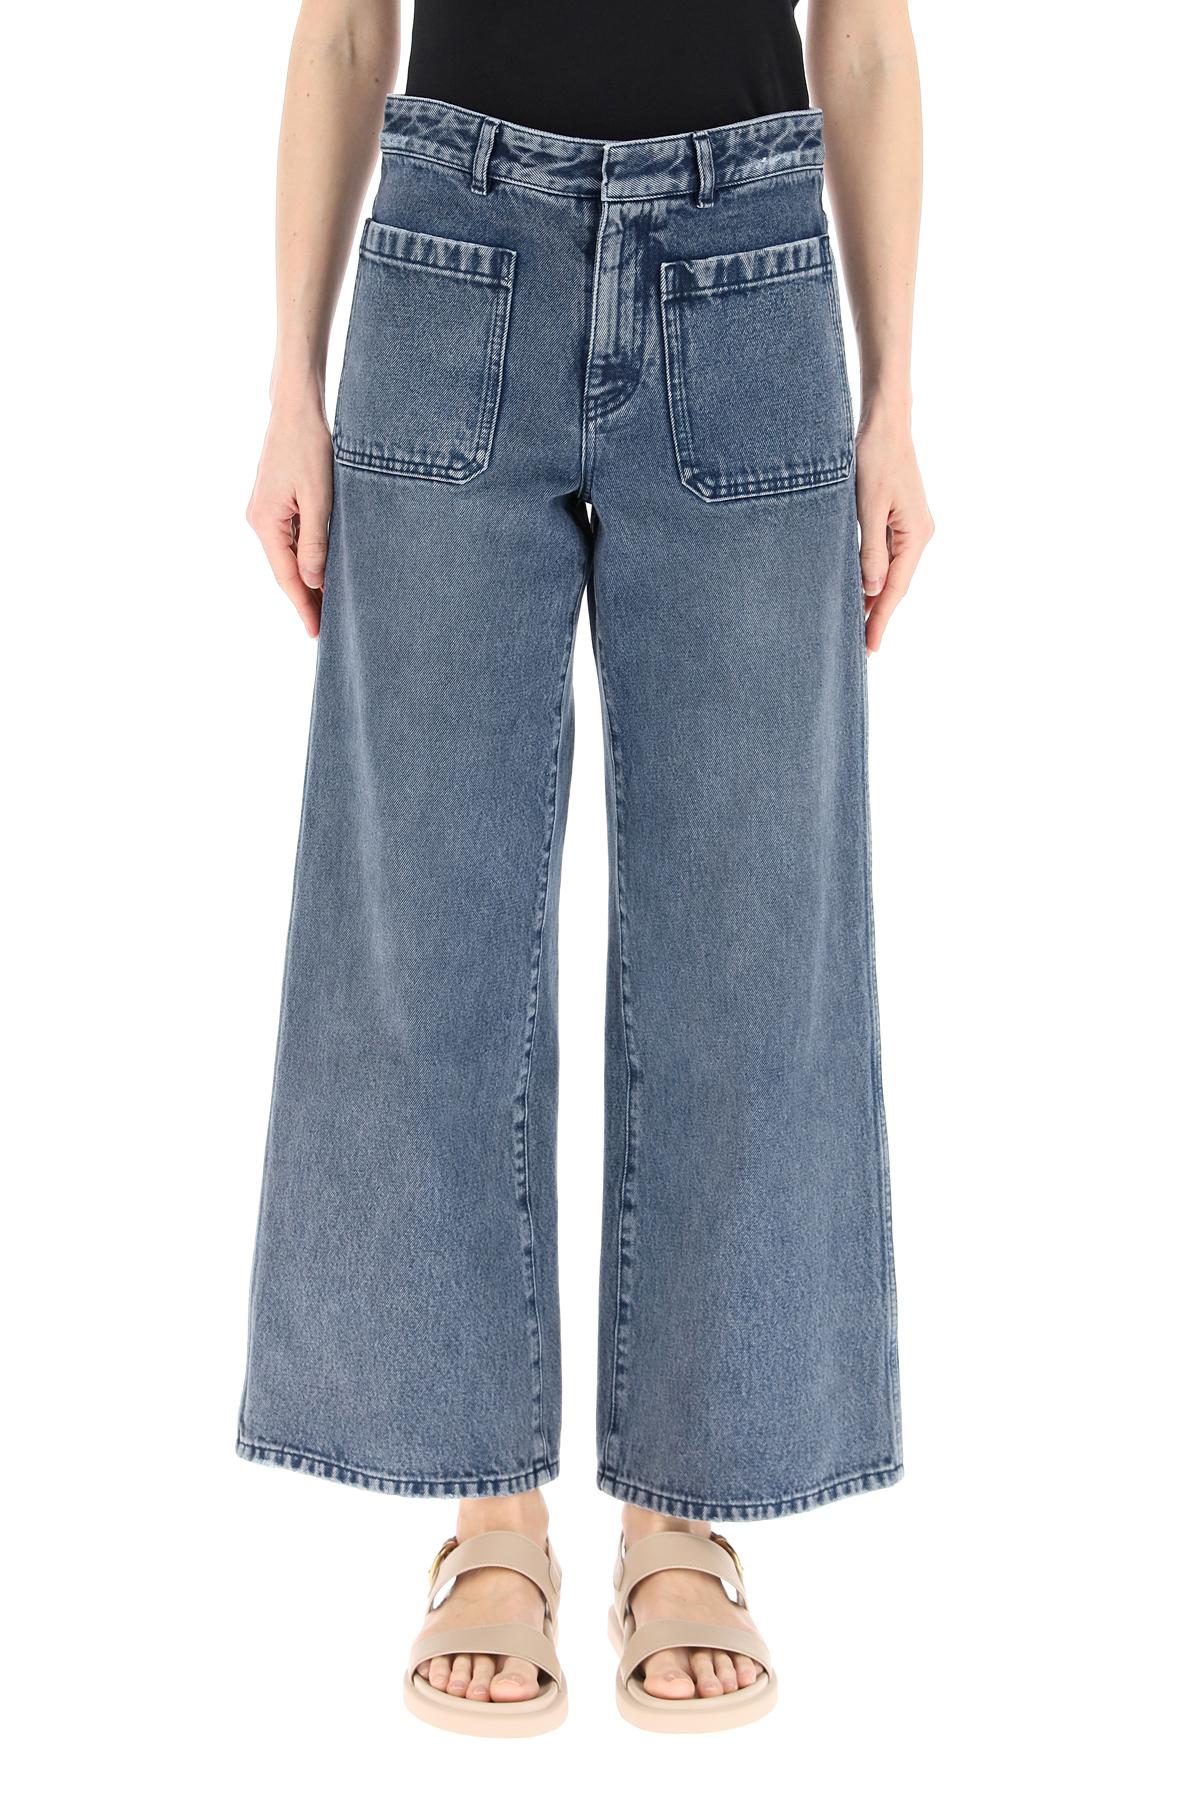 Dior jeans svasati cropped